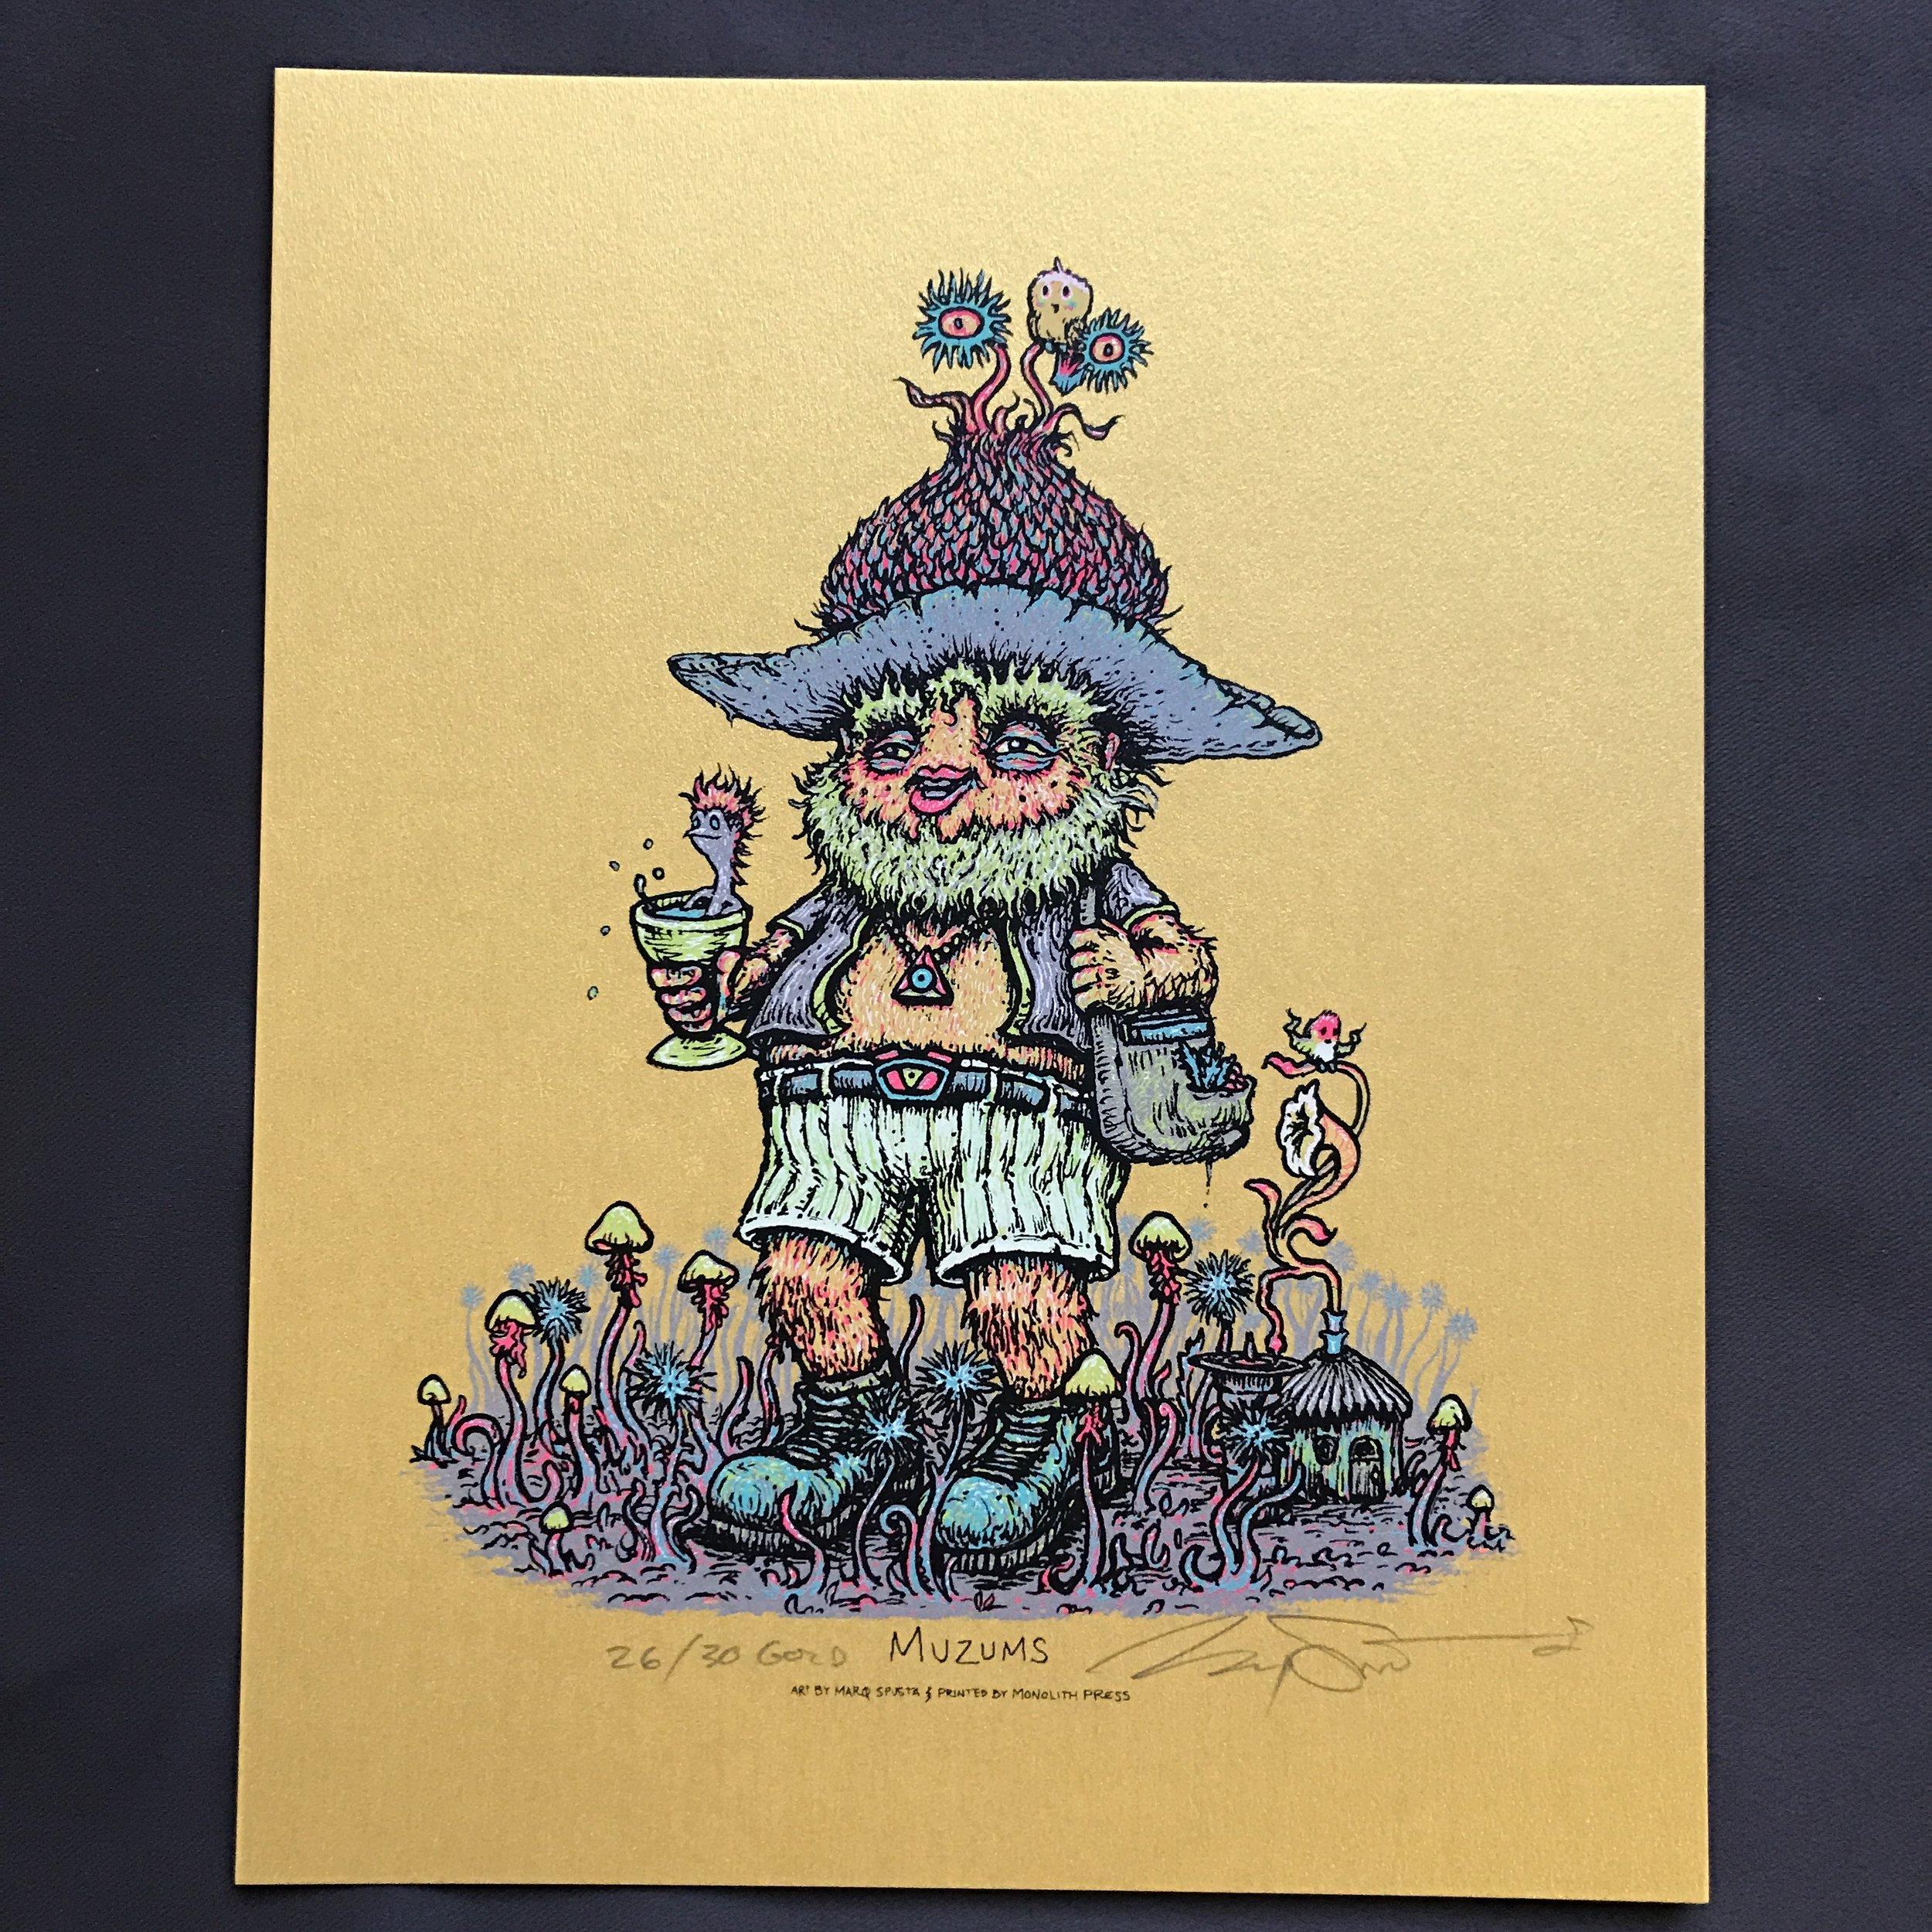 $175 #11 Gold Muzums (edition of 30)